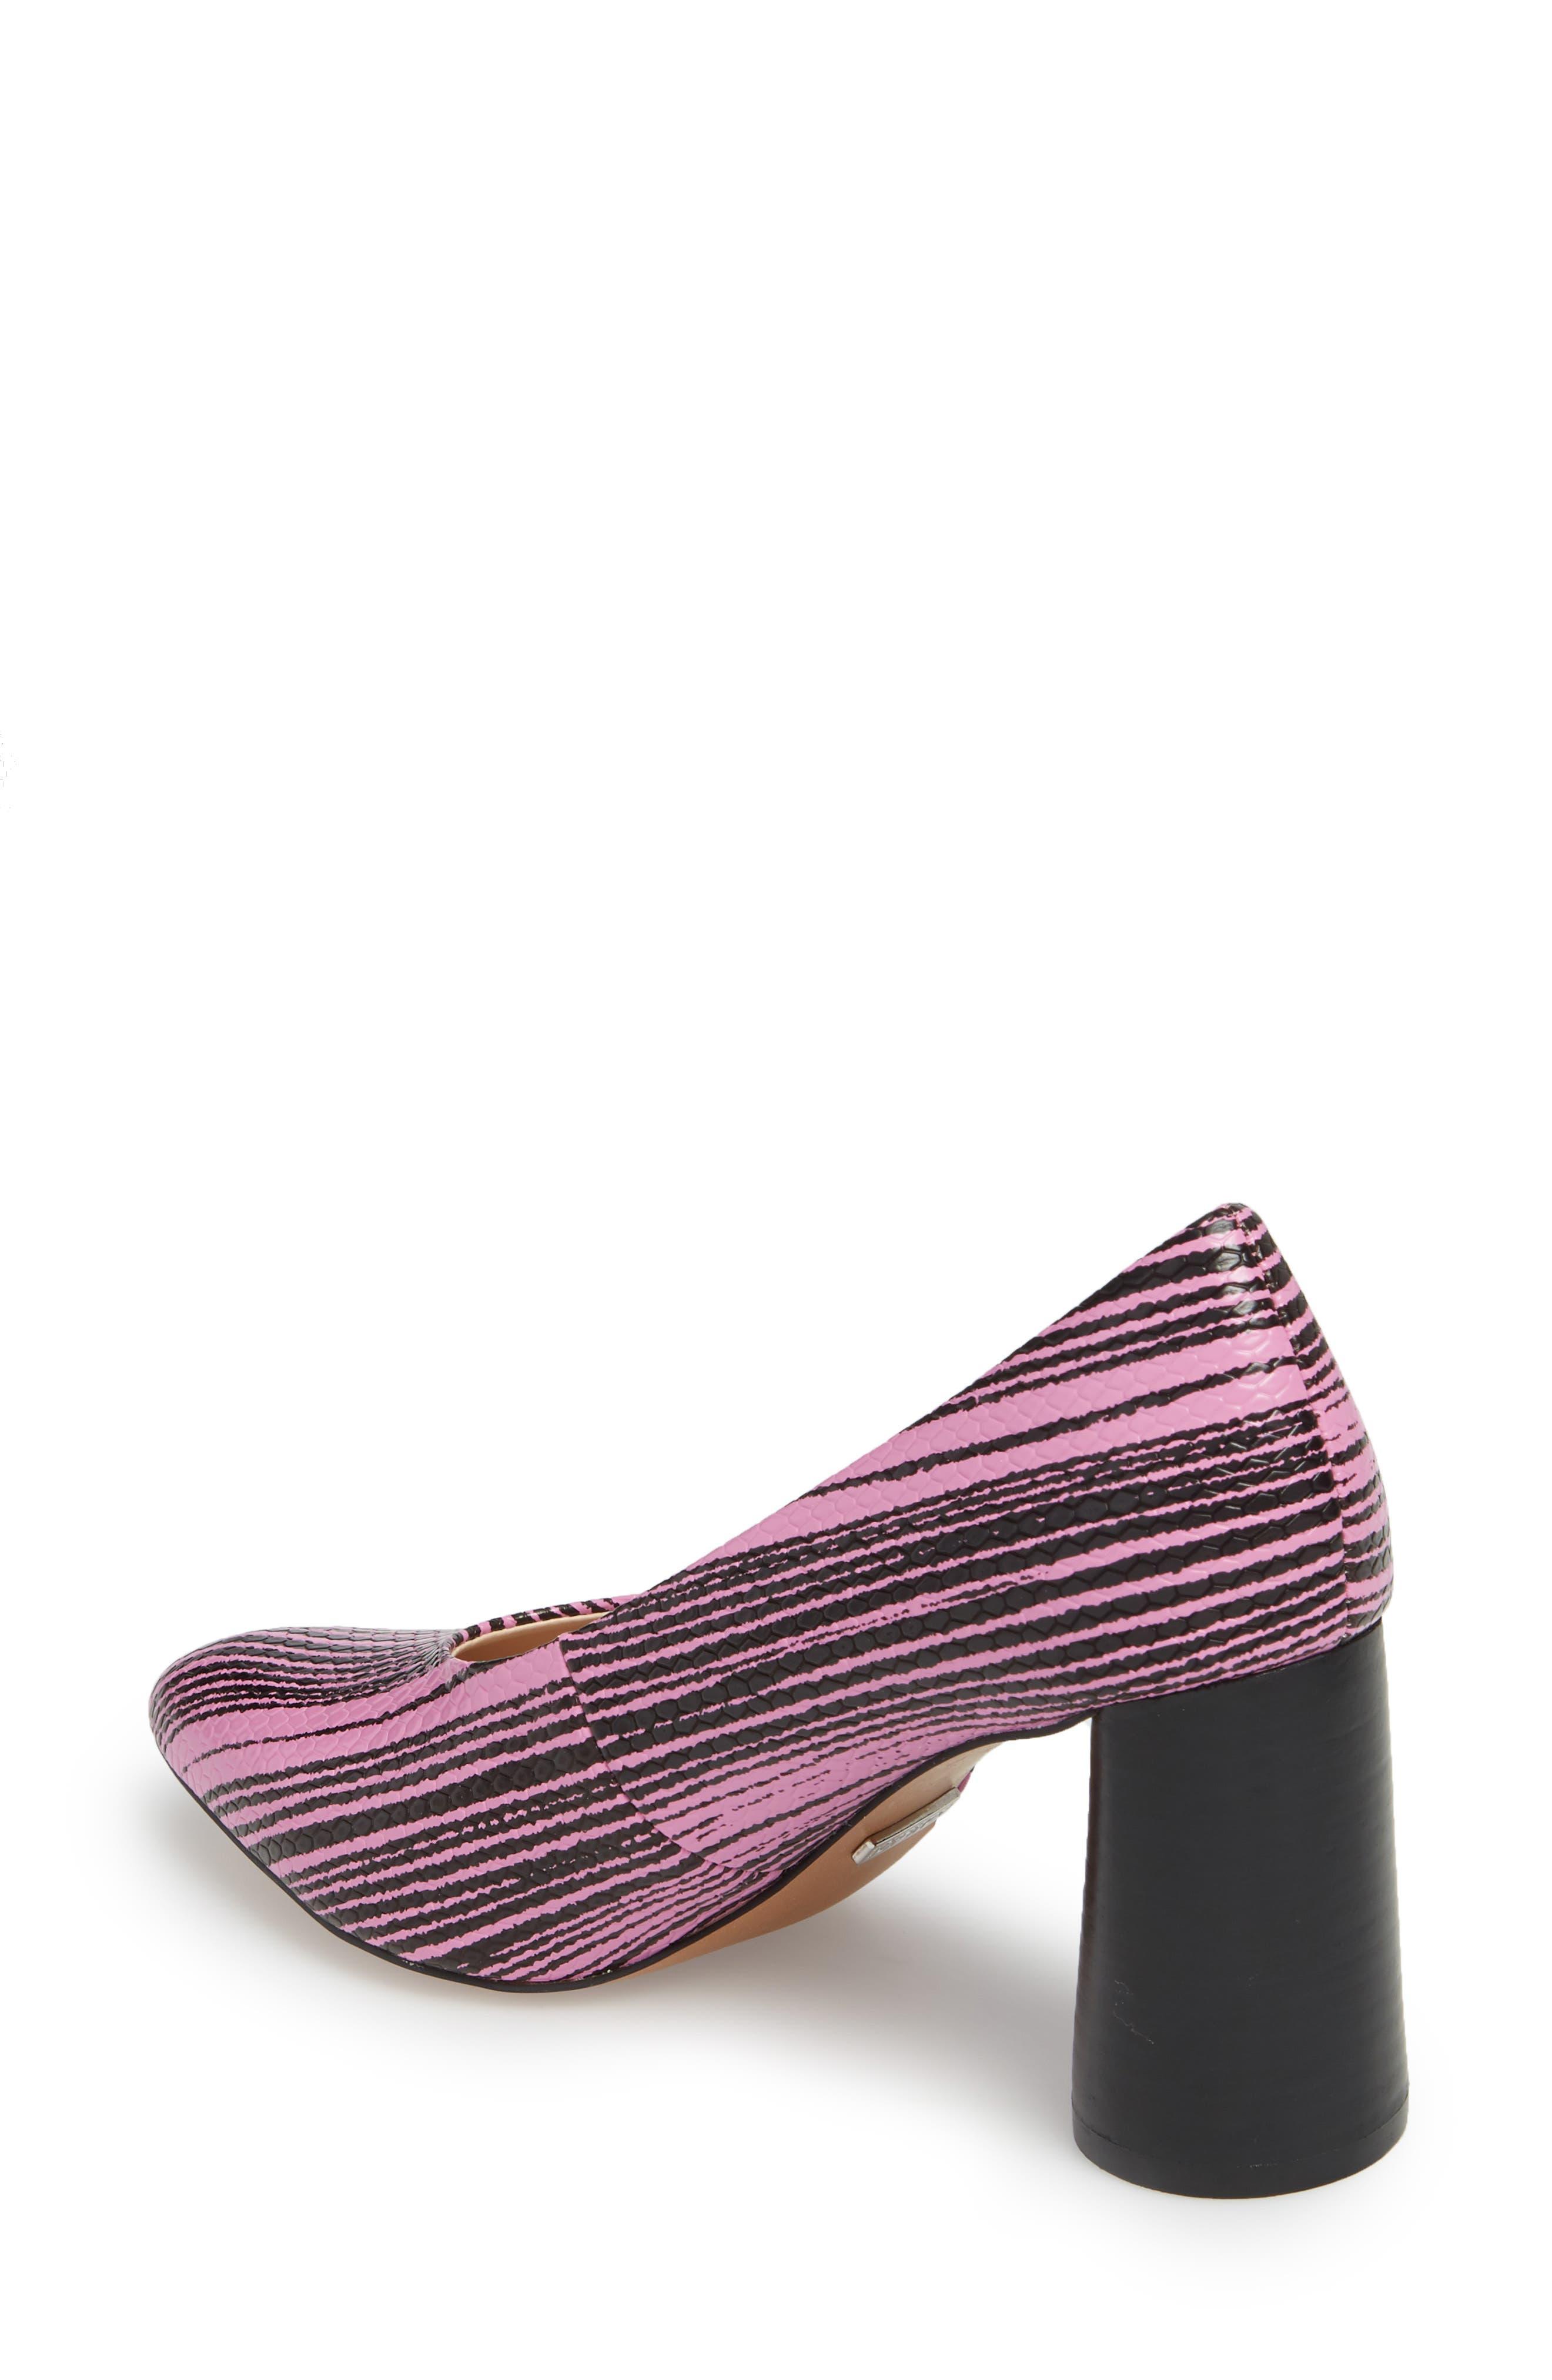 Ginger Cone Heel Pump,                             Alternate thumbnail 2, color,                             Pink